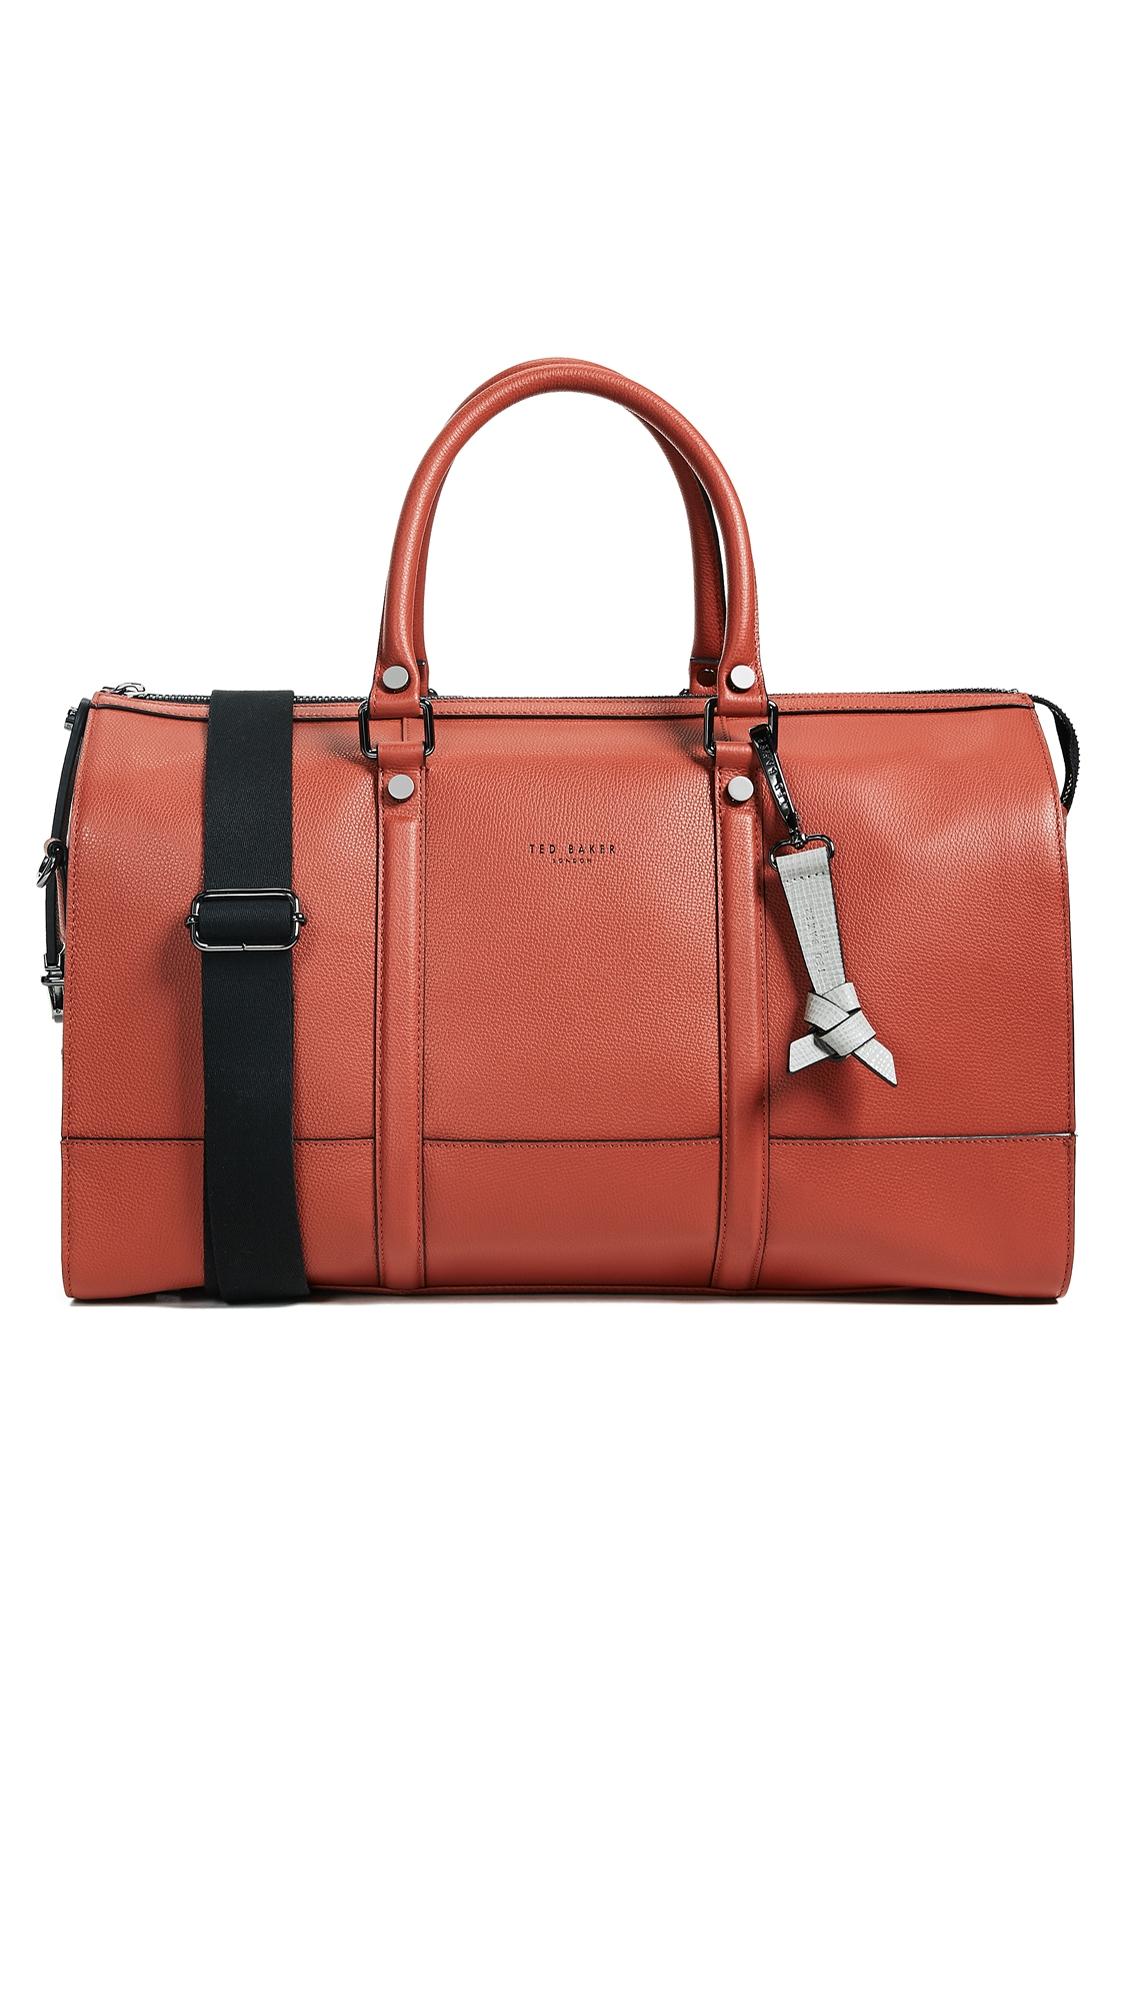 37dc9b87b780 Ted Baker Radical Duffel Bag In Dark Orange